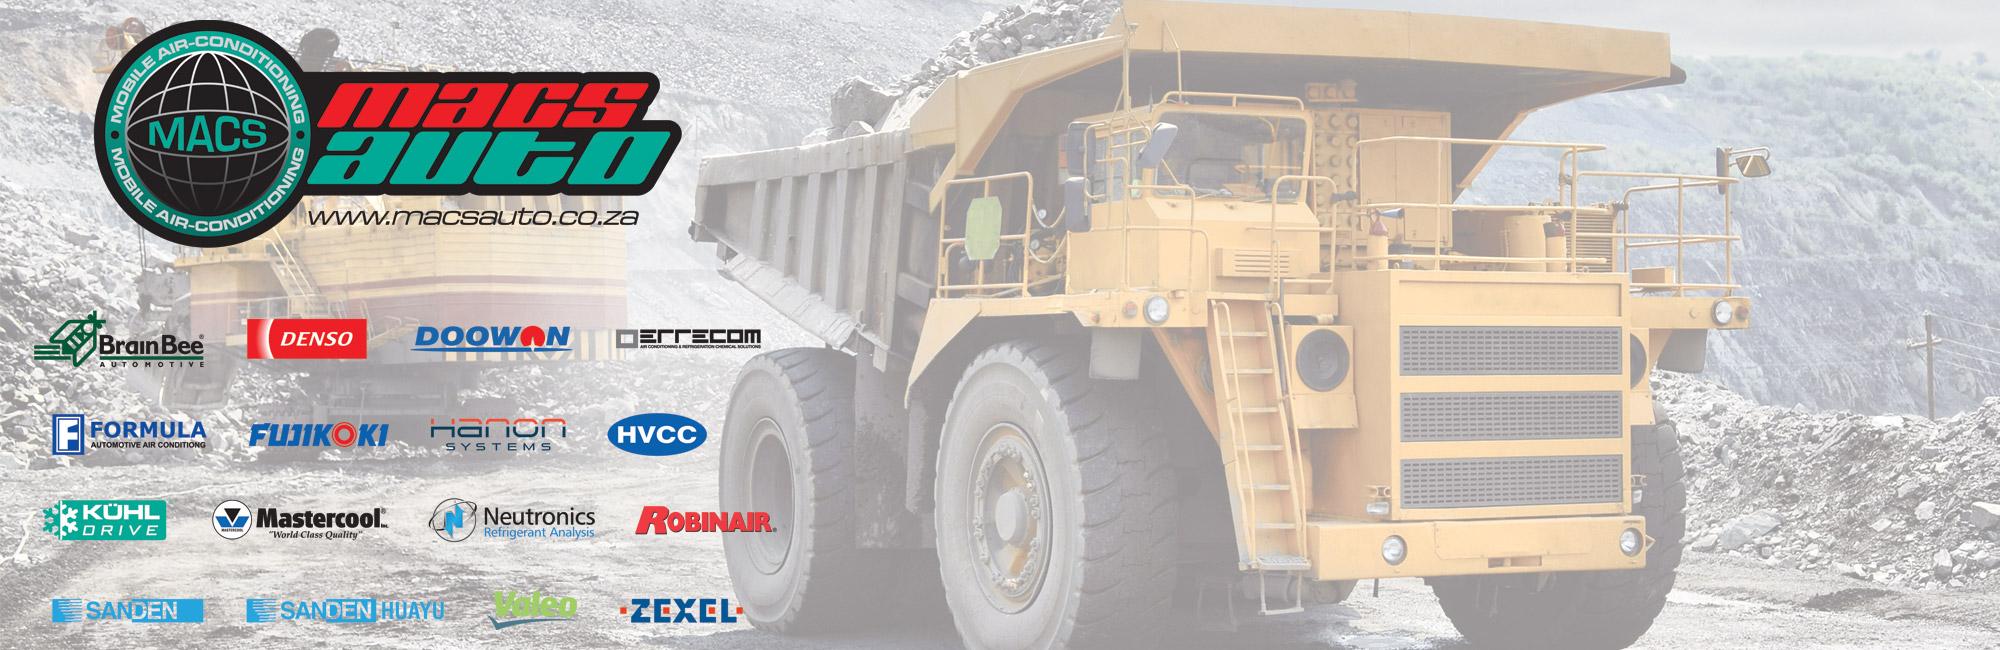 MacsAuto Mining Header